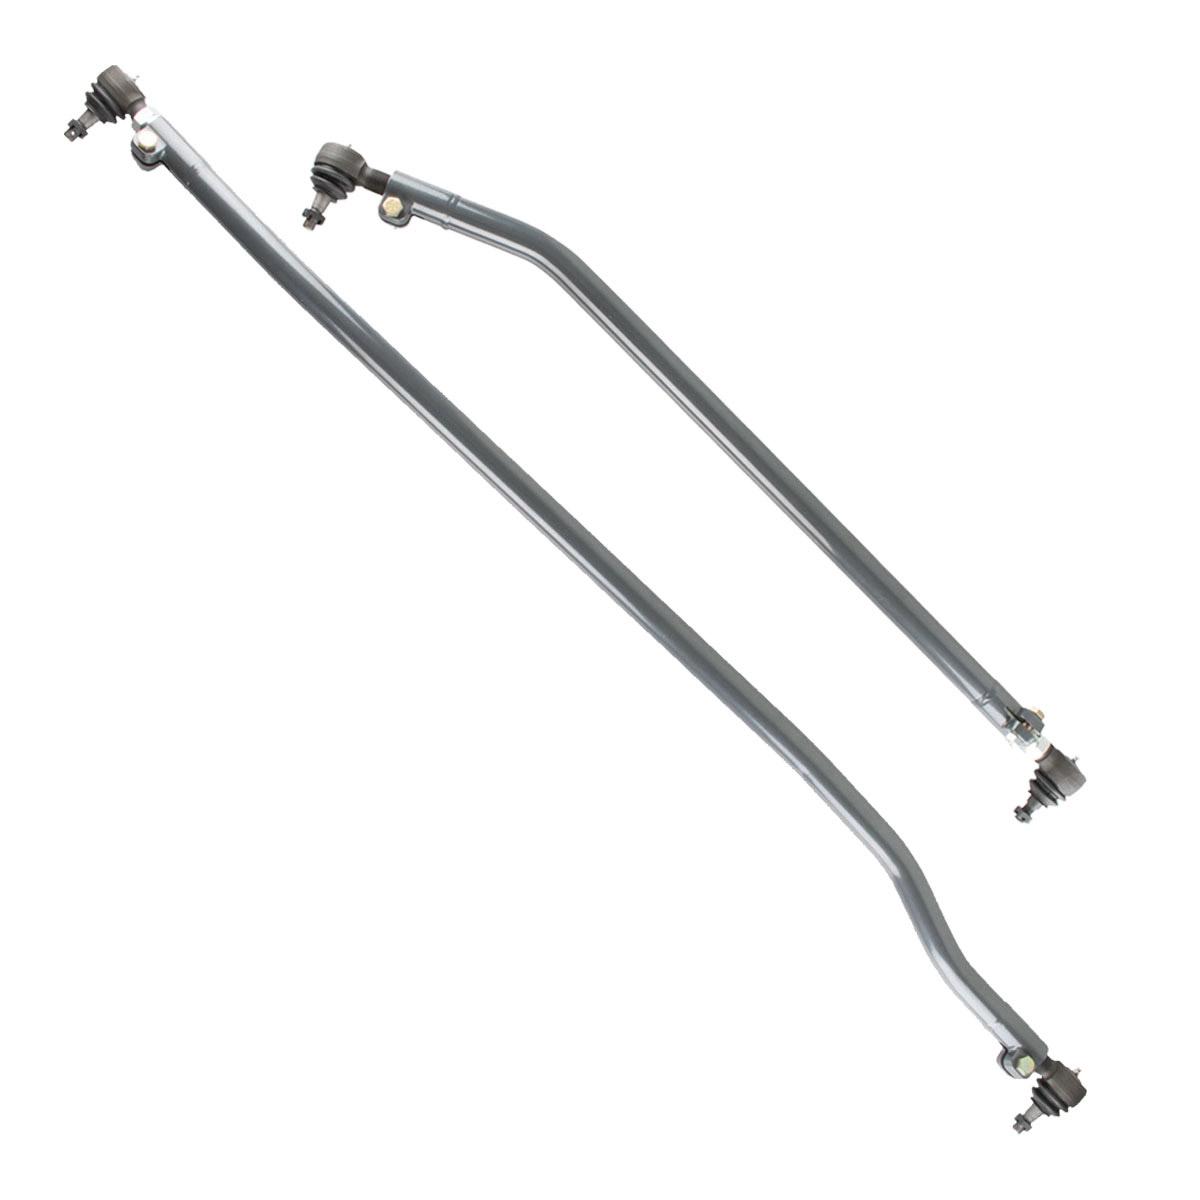 Synergy HD Steering Kit  - JT/JL